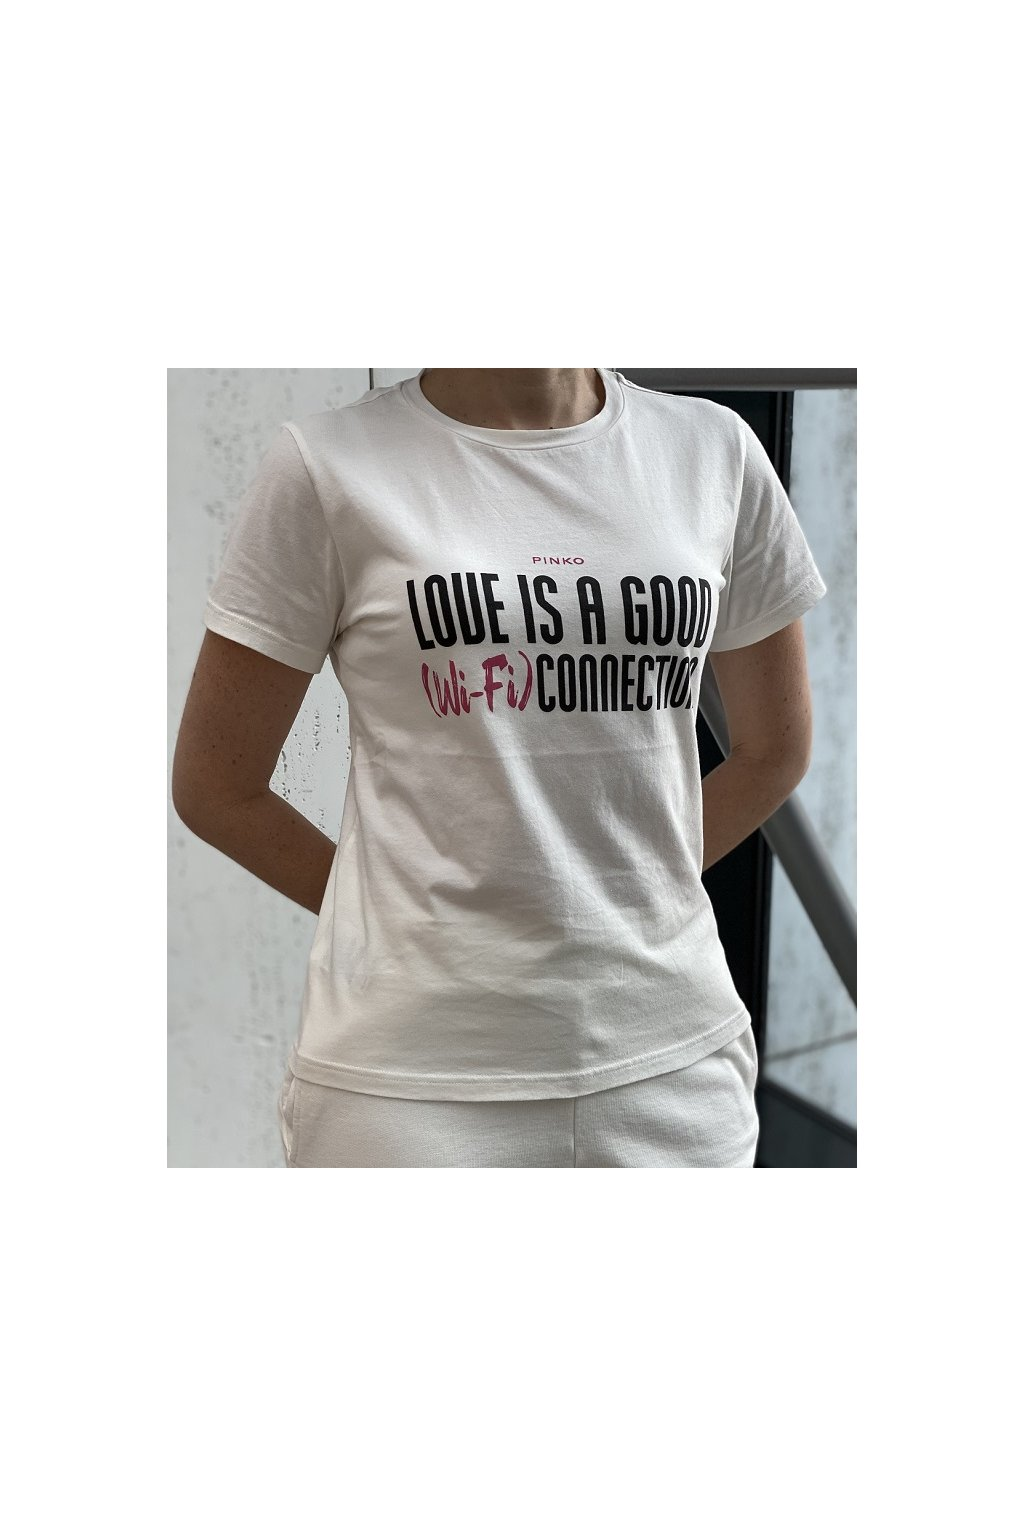 1G163C Y731 Z04 Dámské tričko Pinko Neutrale bílé